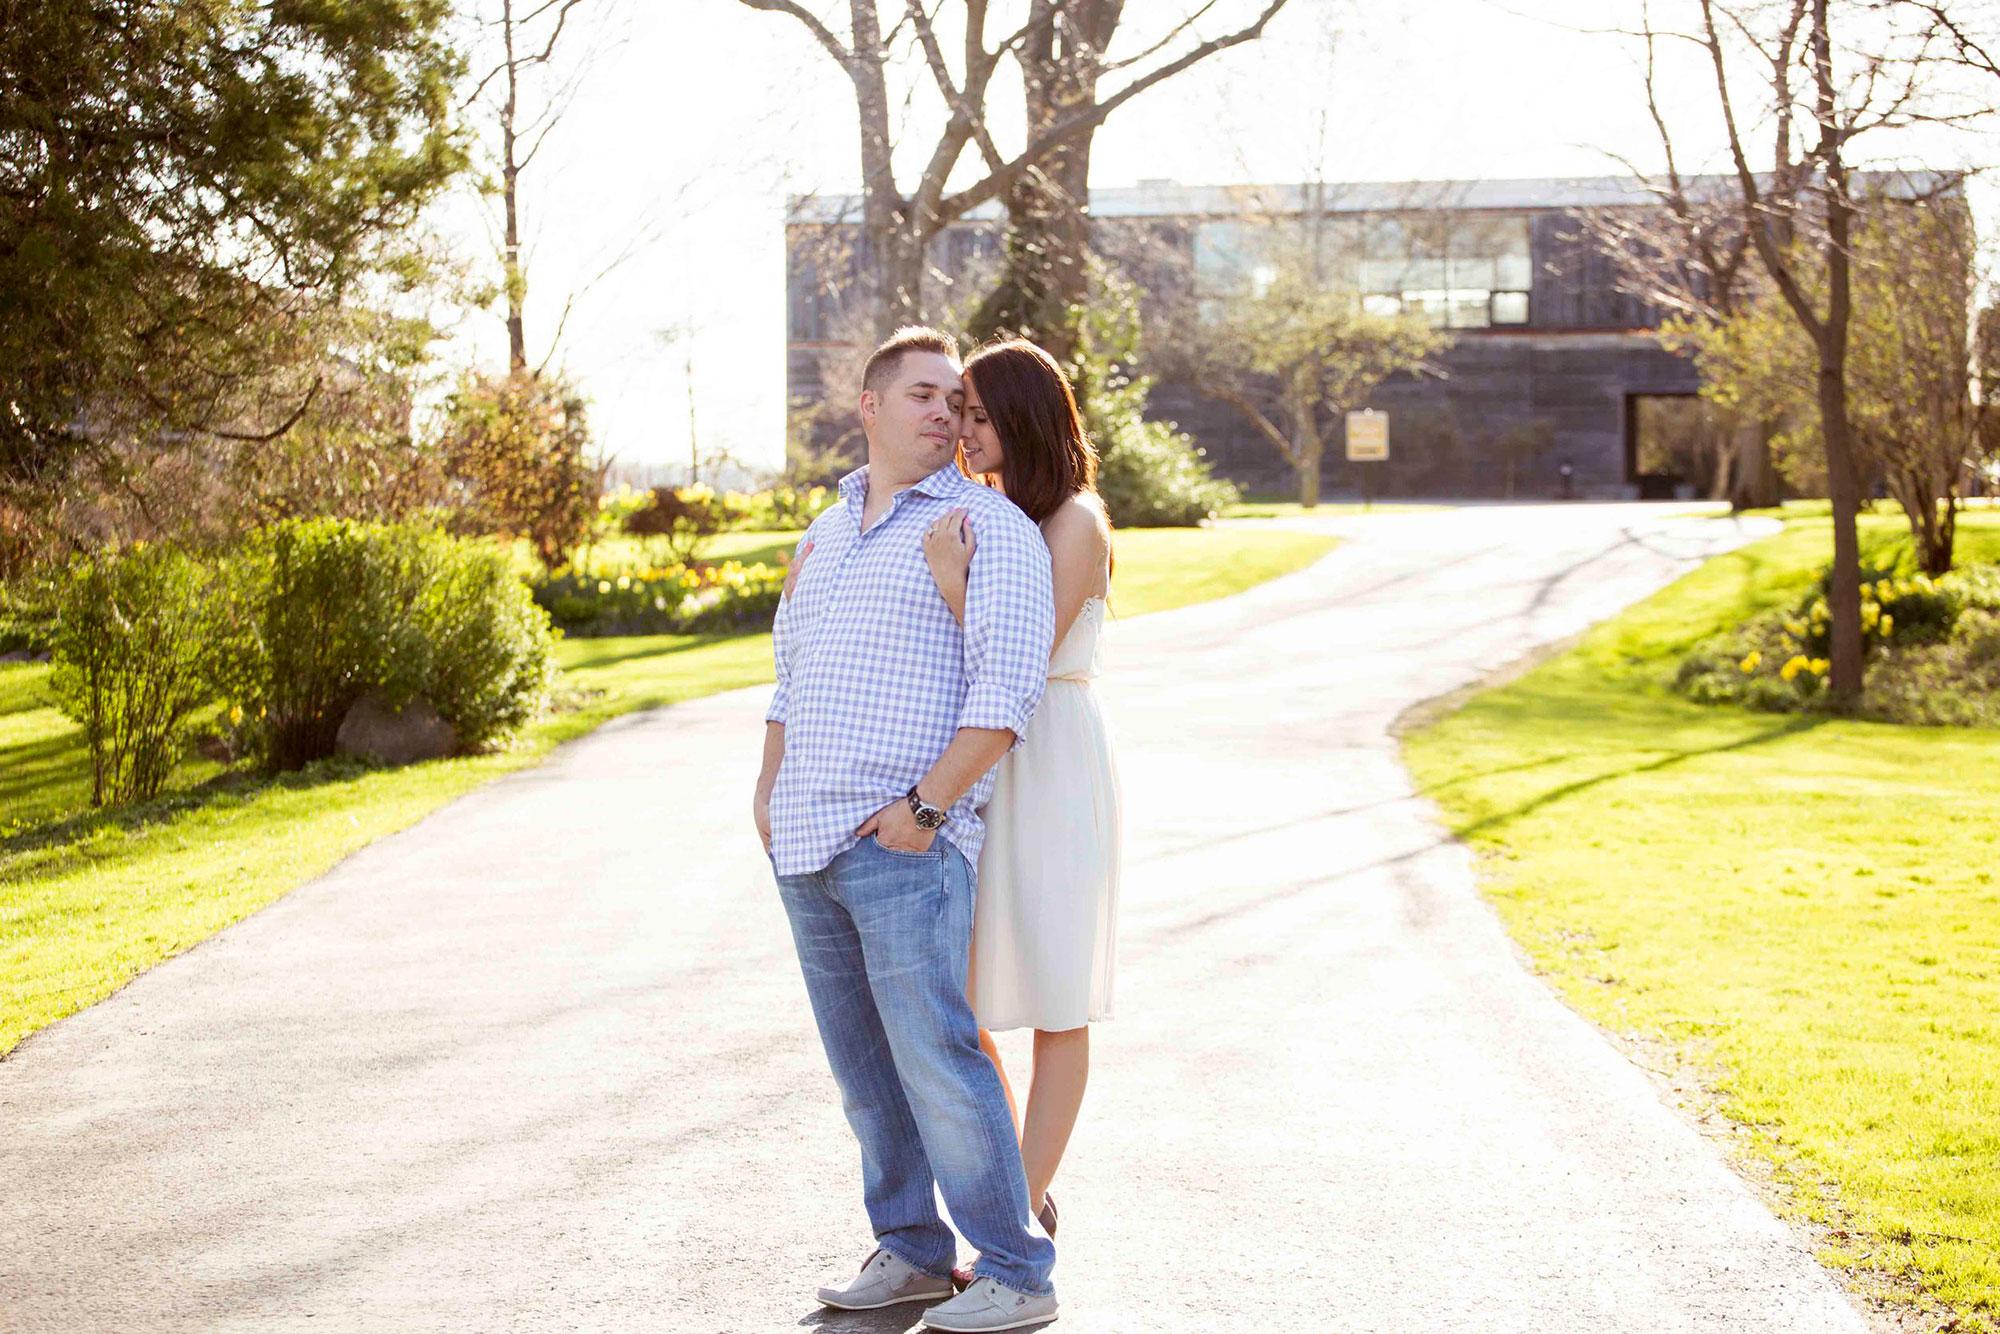 Niagara-on-the-Lake-Engagement-Vineyard-Bride-Photo-By-Gemini-Photography-028.jpg